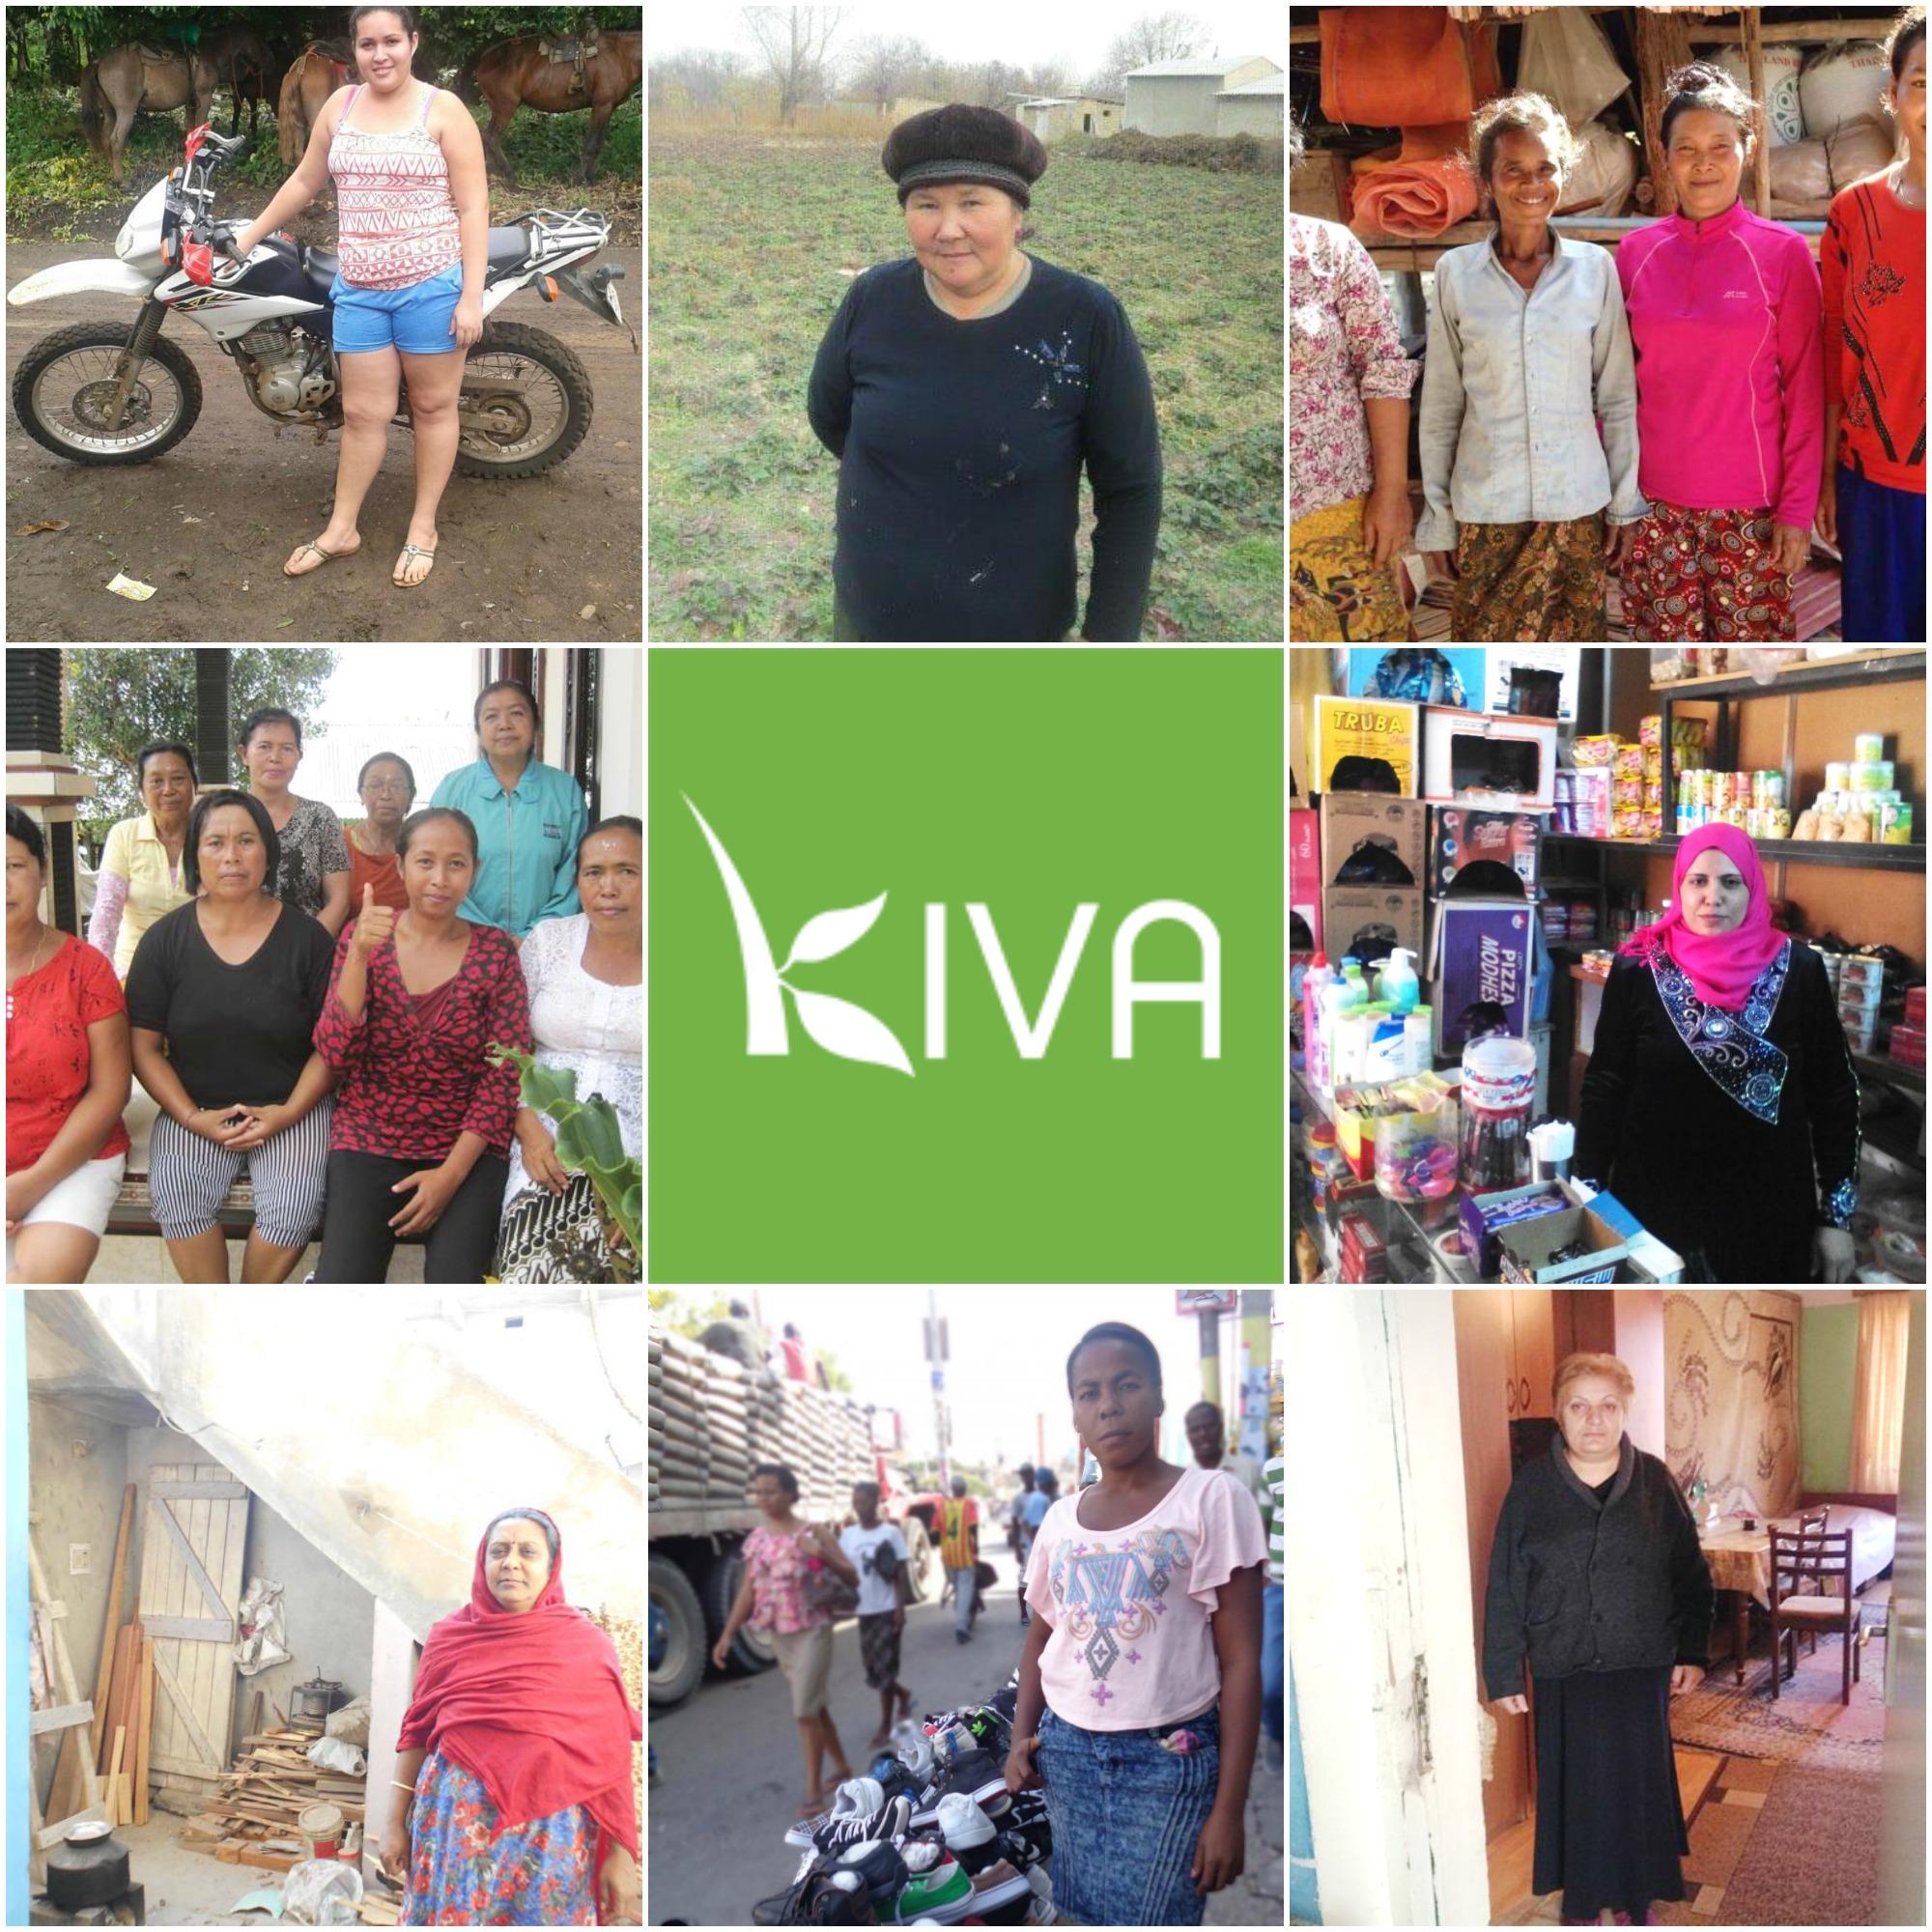 Kiva February 2016 Quest